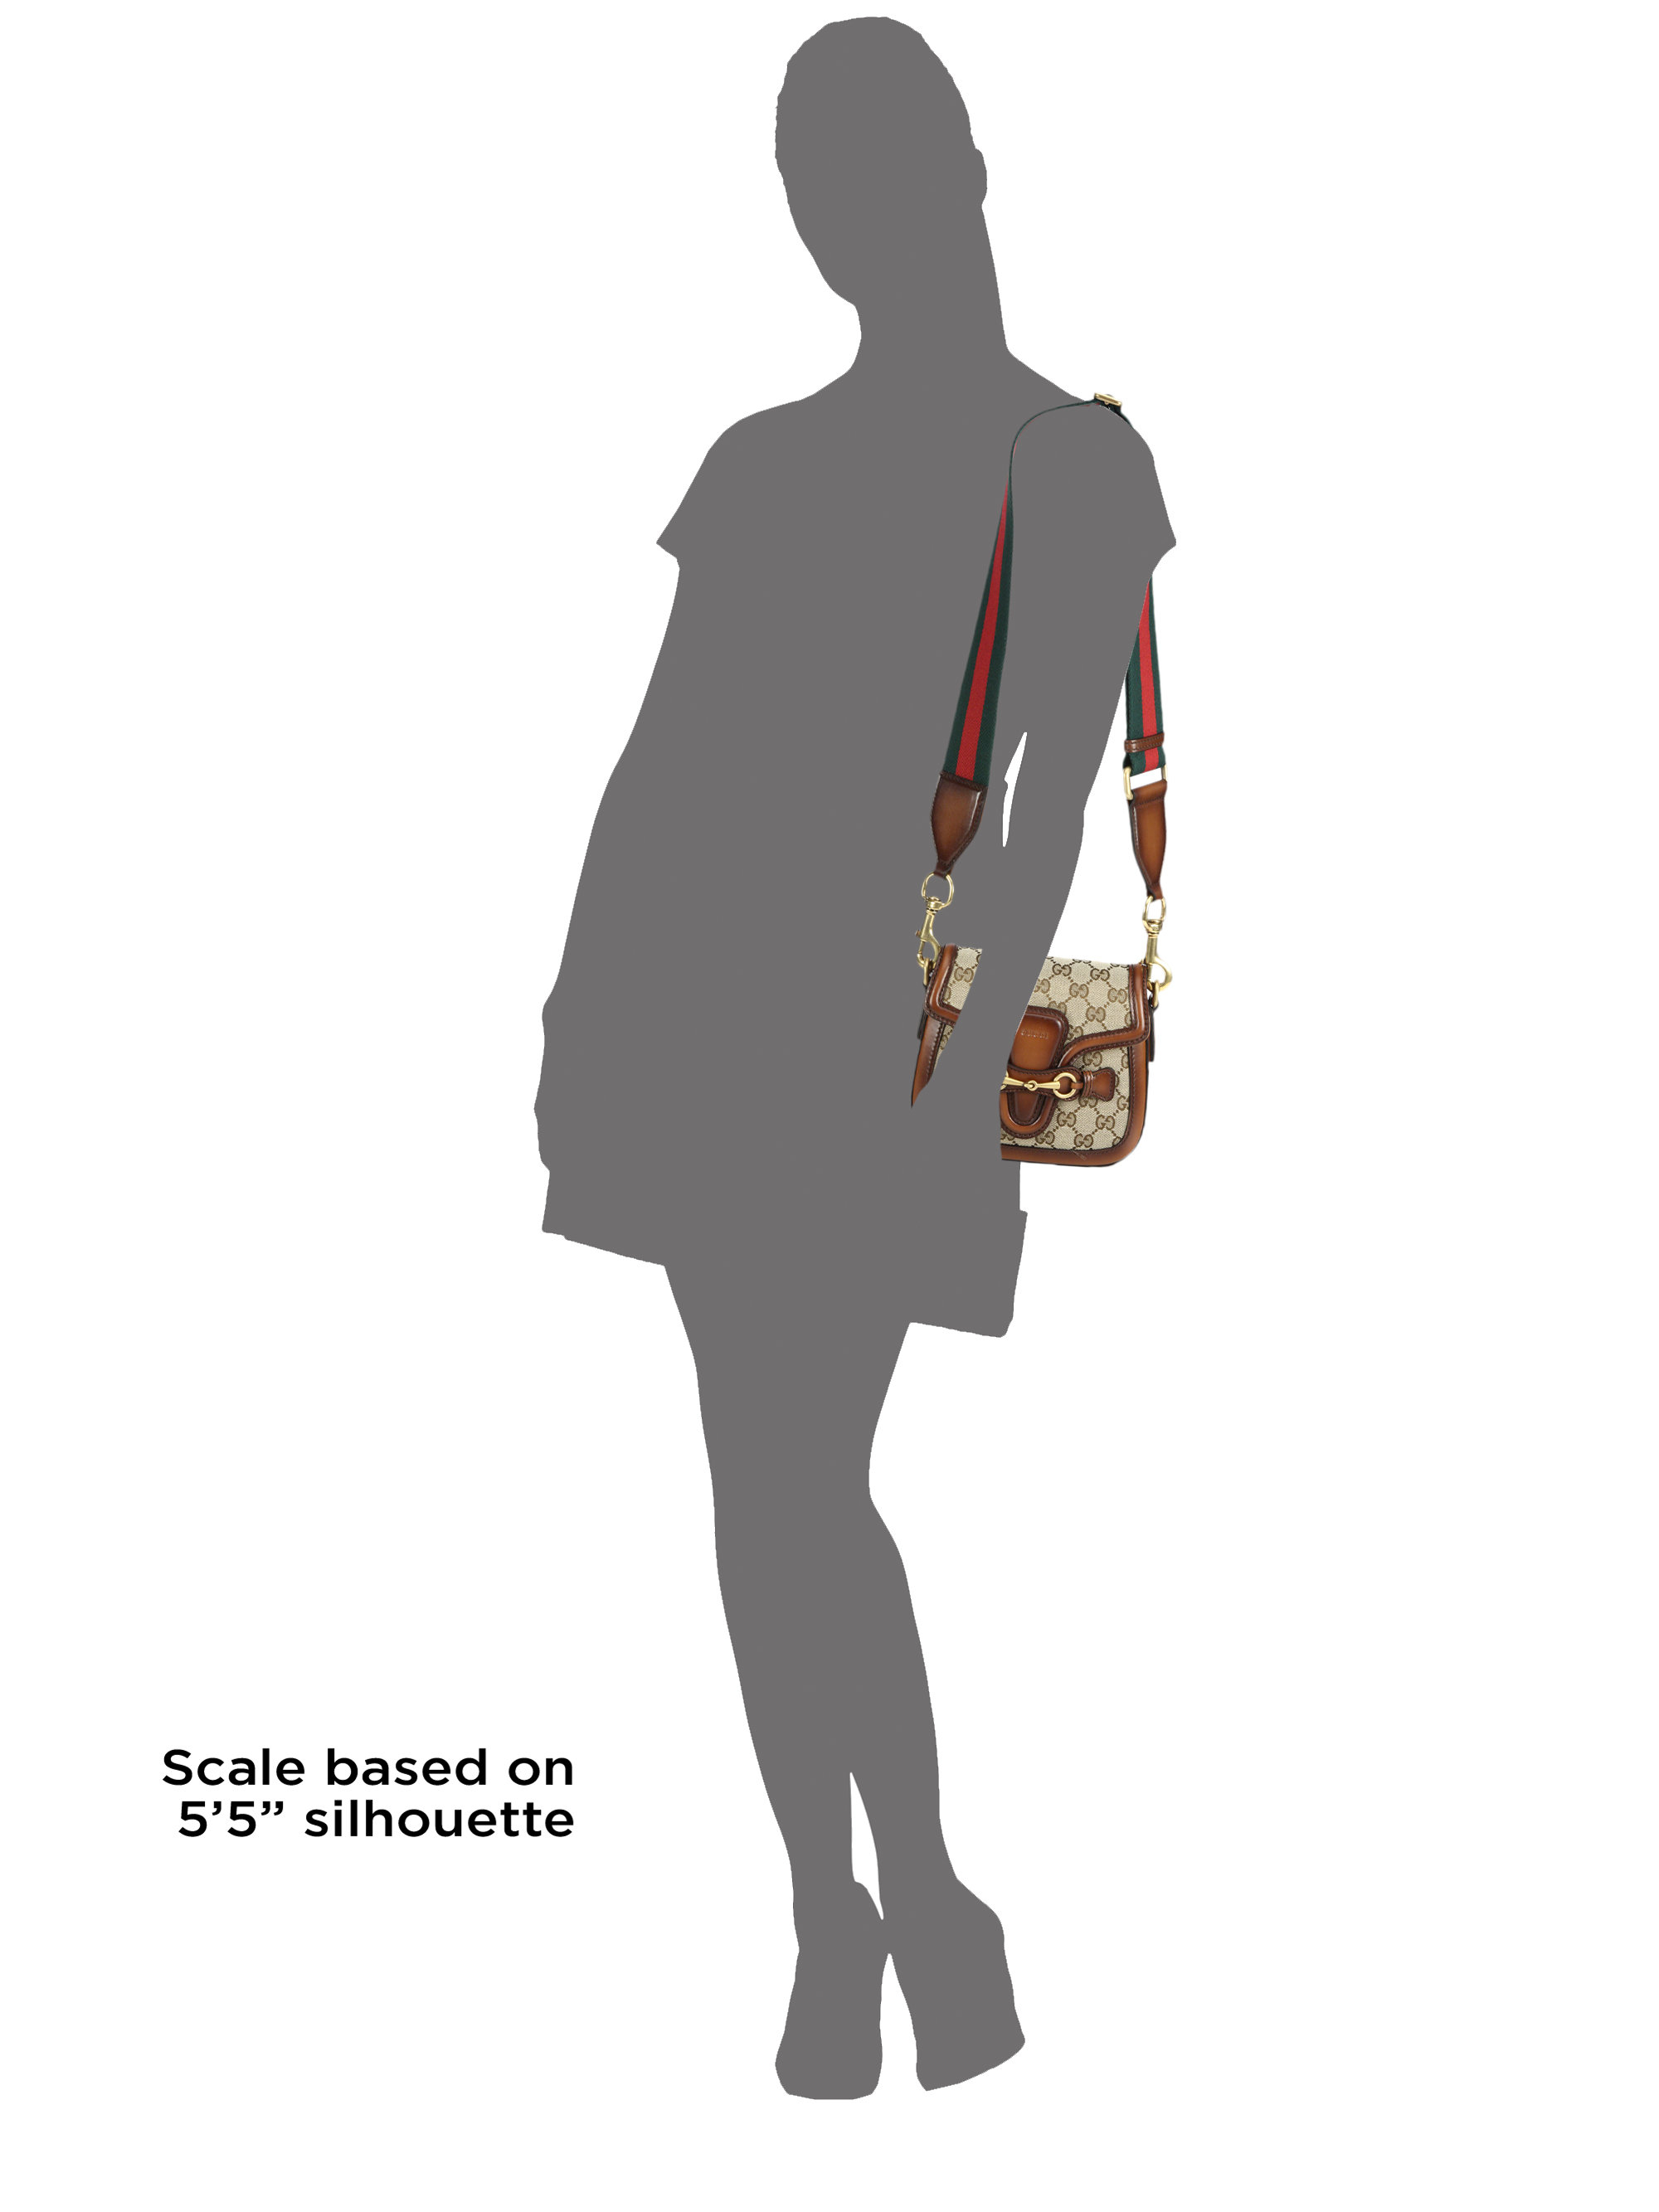 Gucci Lady Web Original Gg Canvas Shoulder Bag in Natural | Lyst